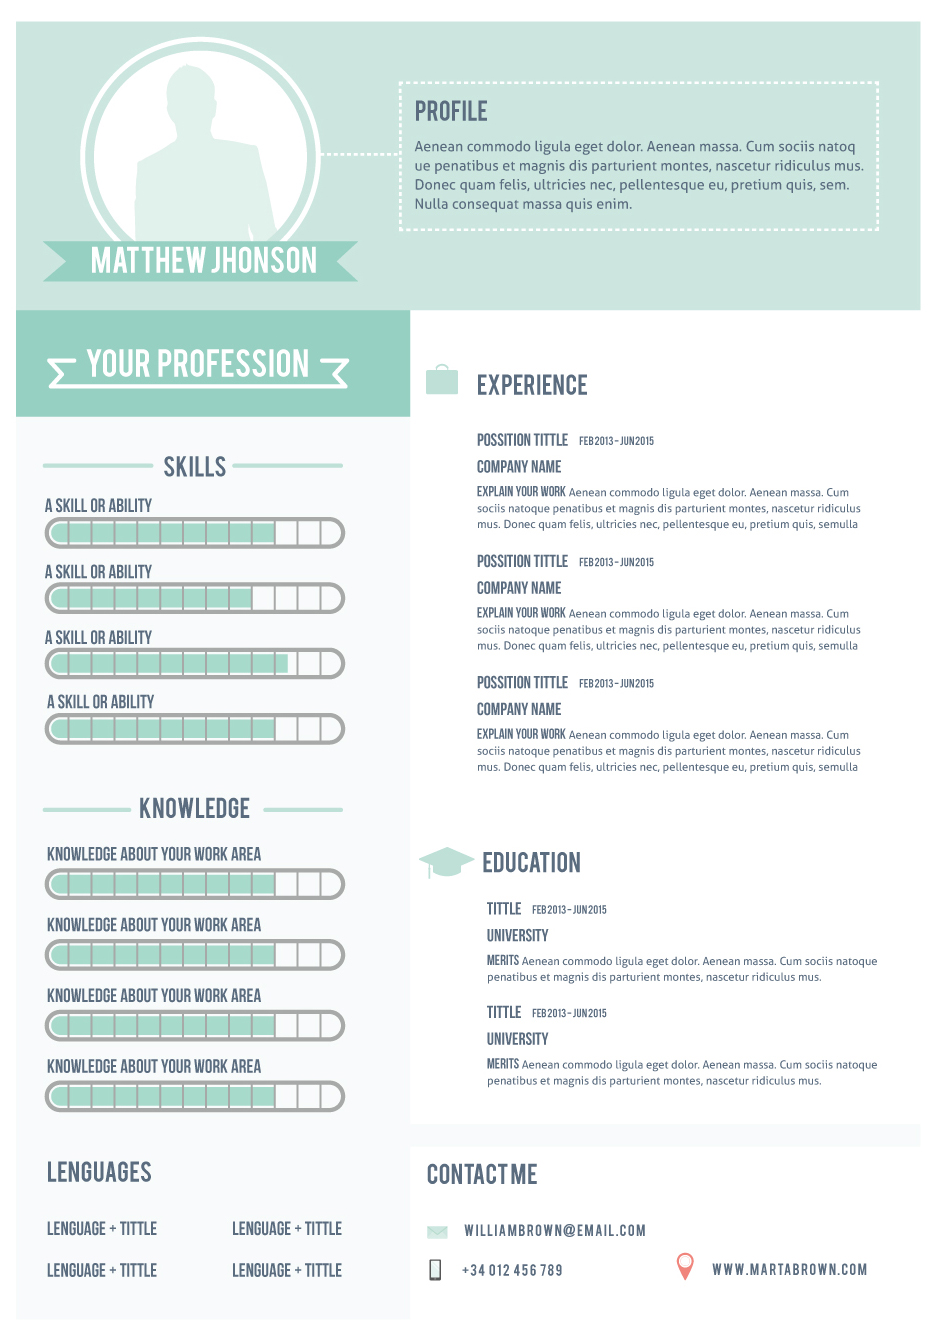 Resume-4